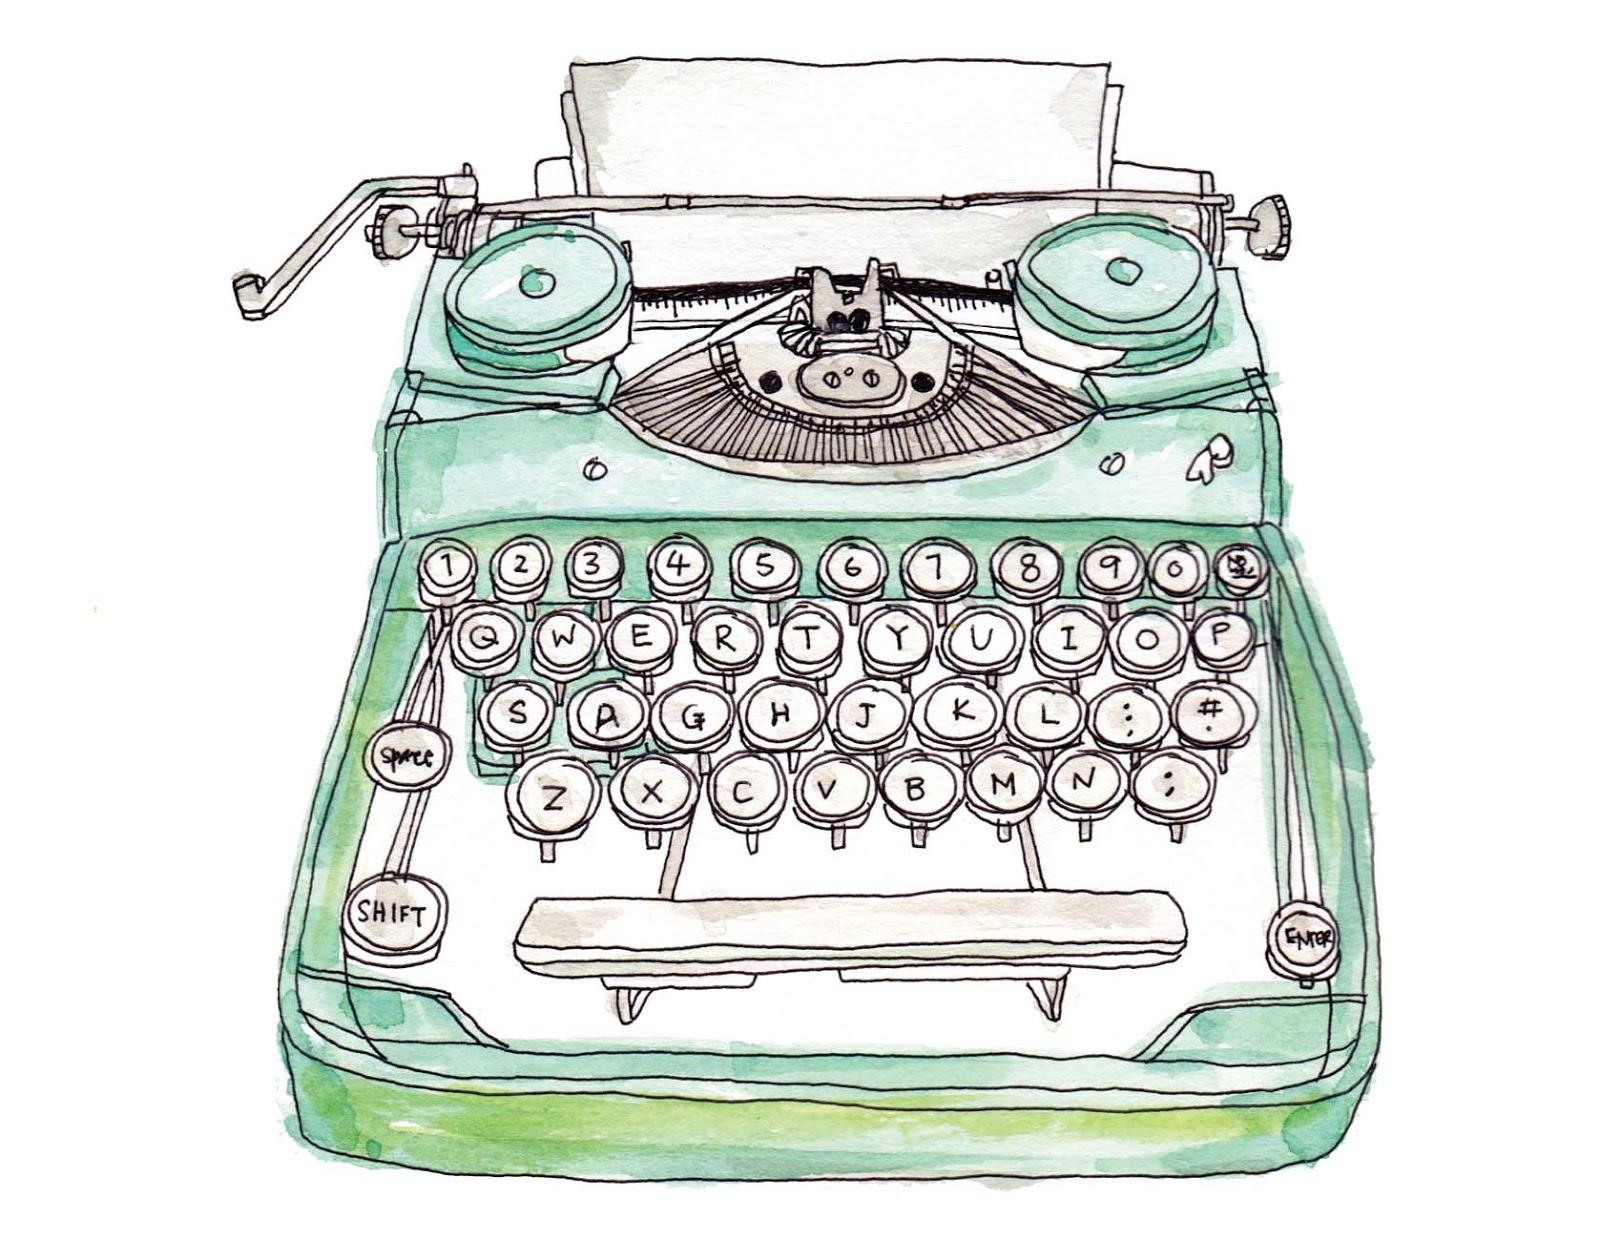 Drawn typewriter Illustrations about Typewriters this illustrations